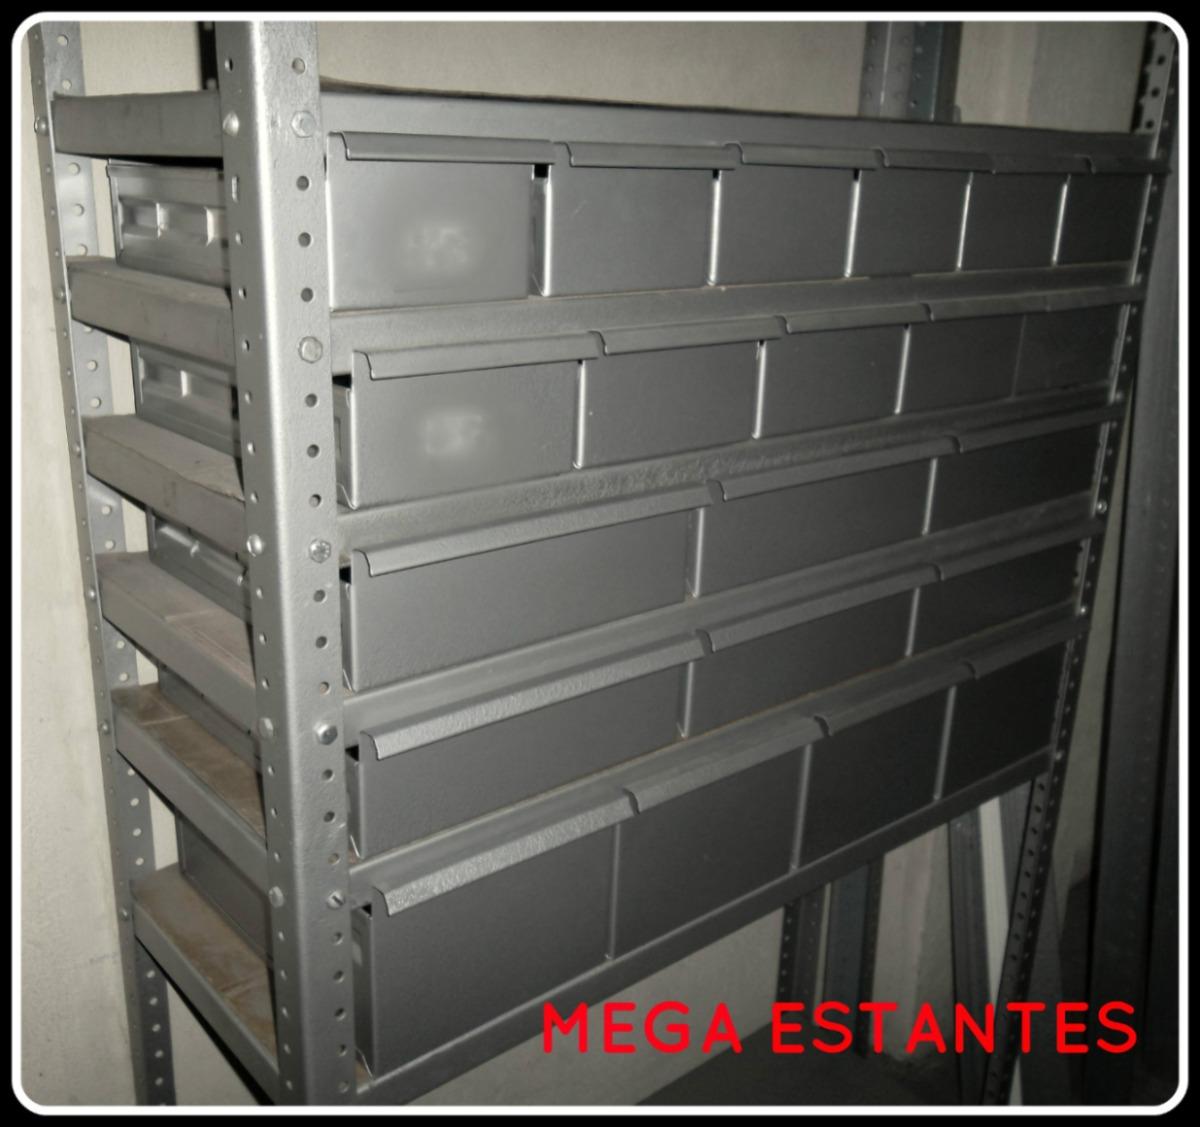 Estanterias Para Baños Mercado Libre: Gaveta Para Anaquel, Estantería Metálica – $ 4000 en MercadoLibre